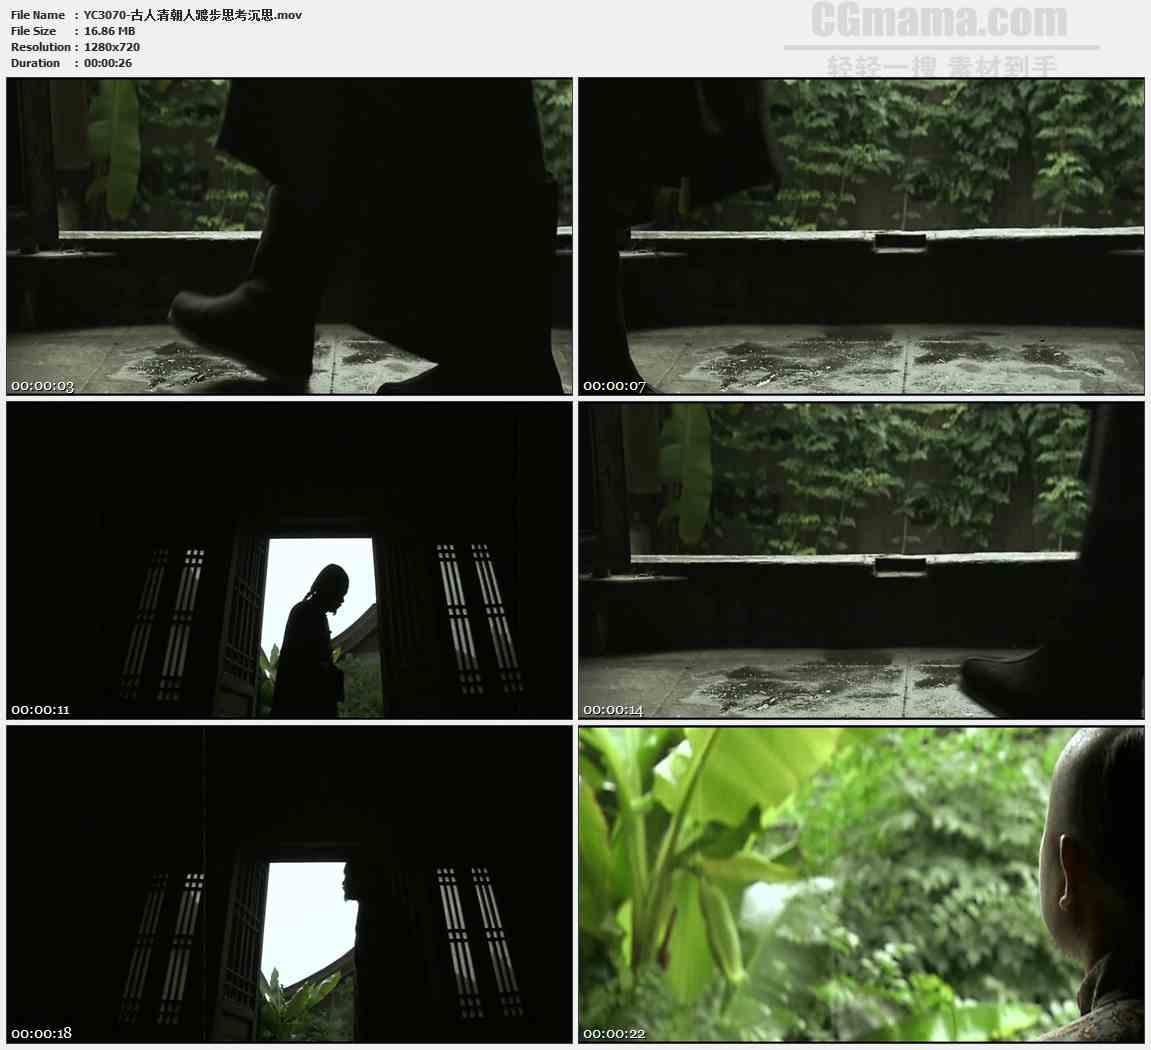 YC3070-古人清朝人踱步思考沉思高清实拍视频素材